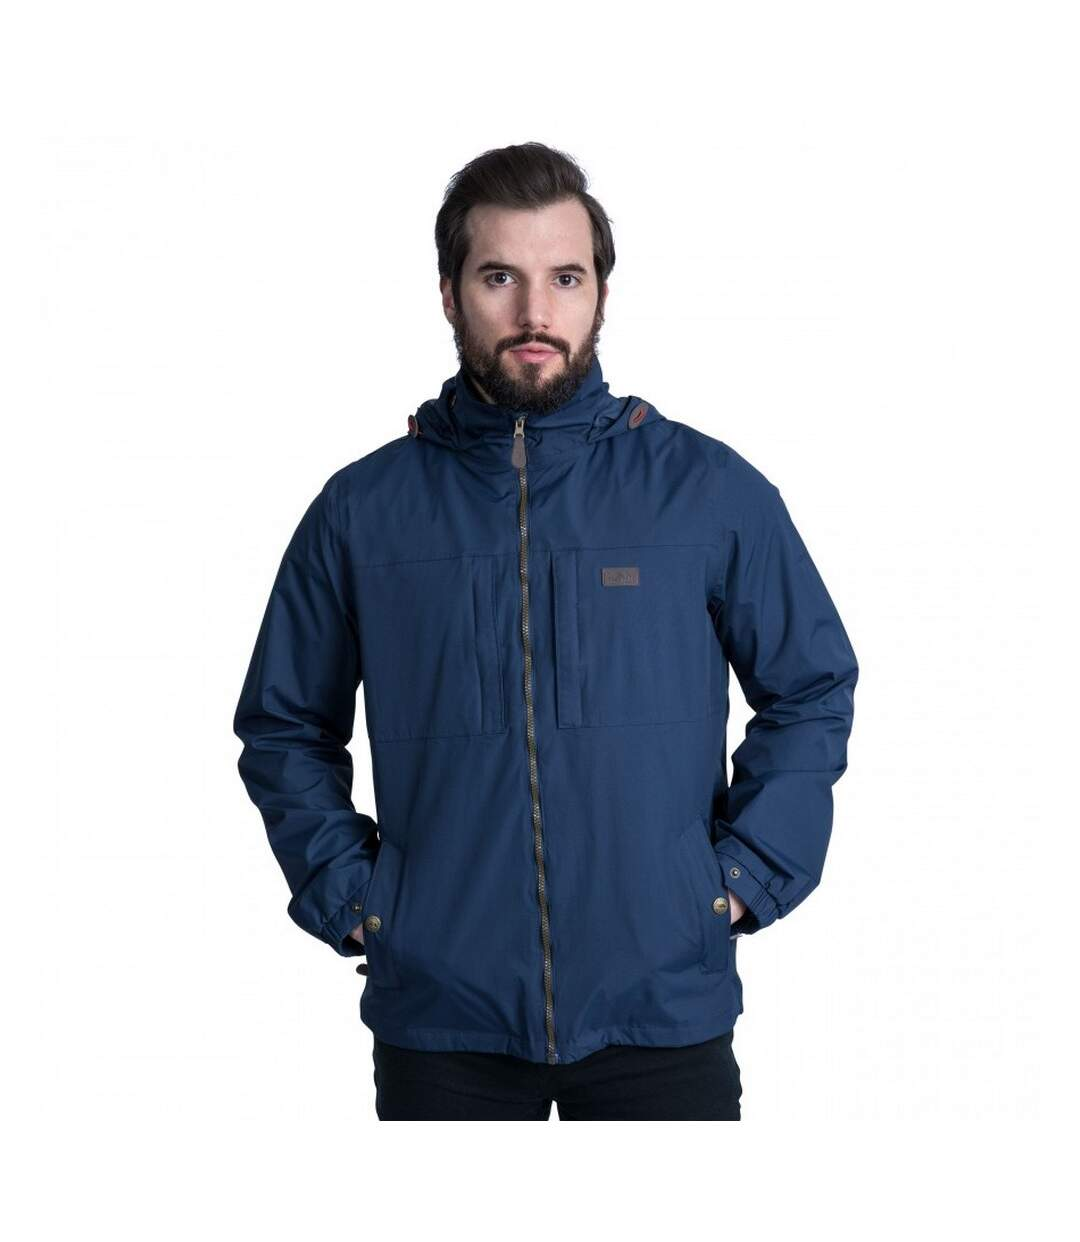 Trespass Mens Cartwright Waterproof Jacket (Navy) - UTTP4117